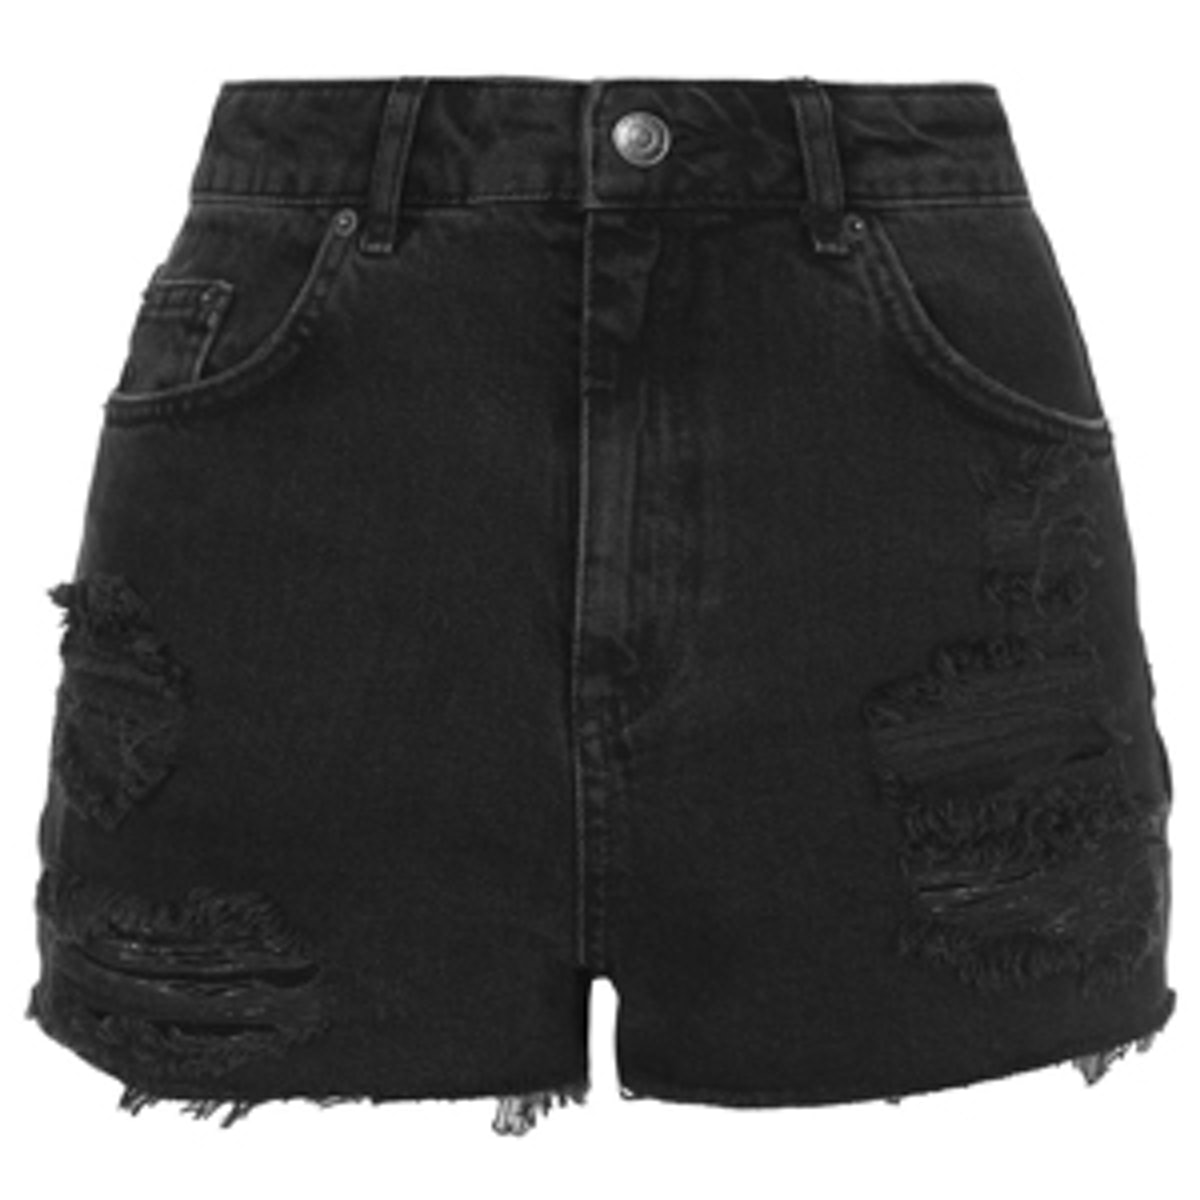 Moto Black Ripped Mom Shorts